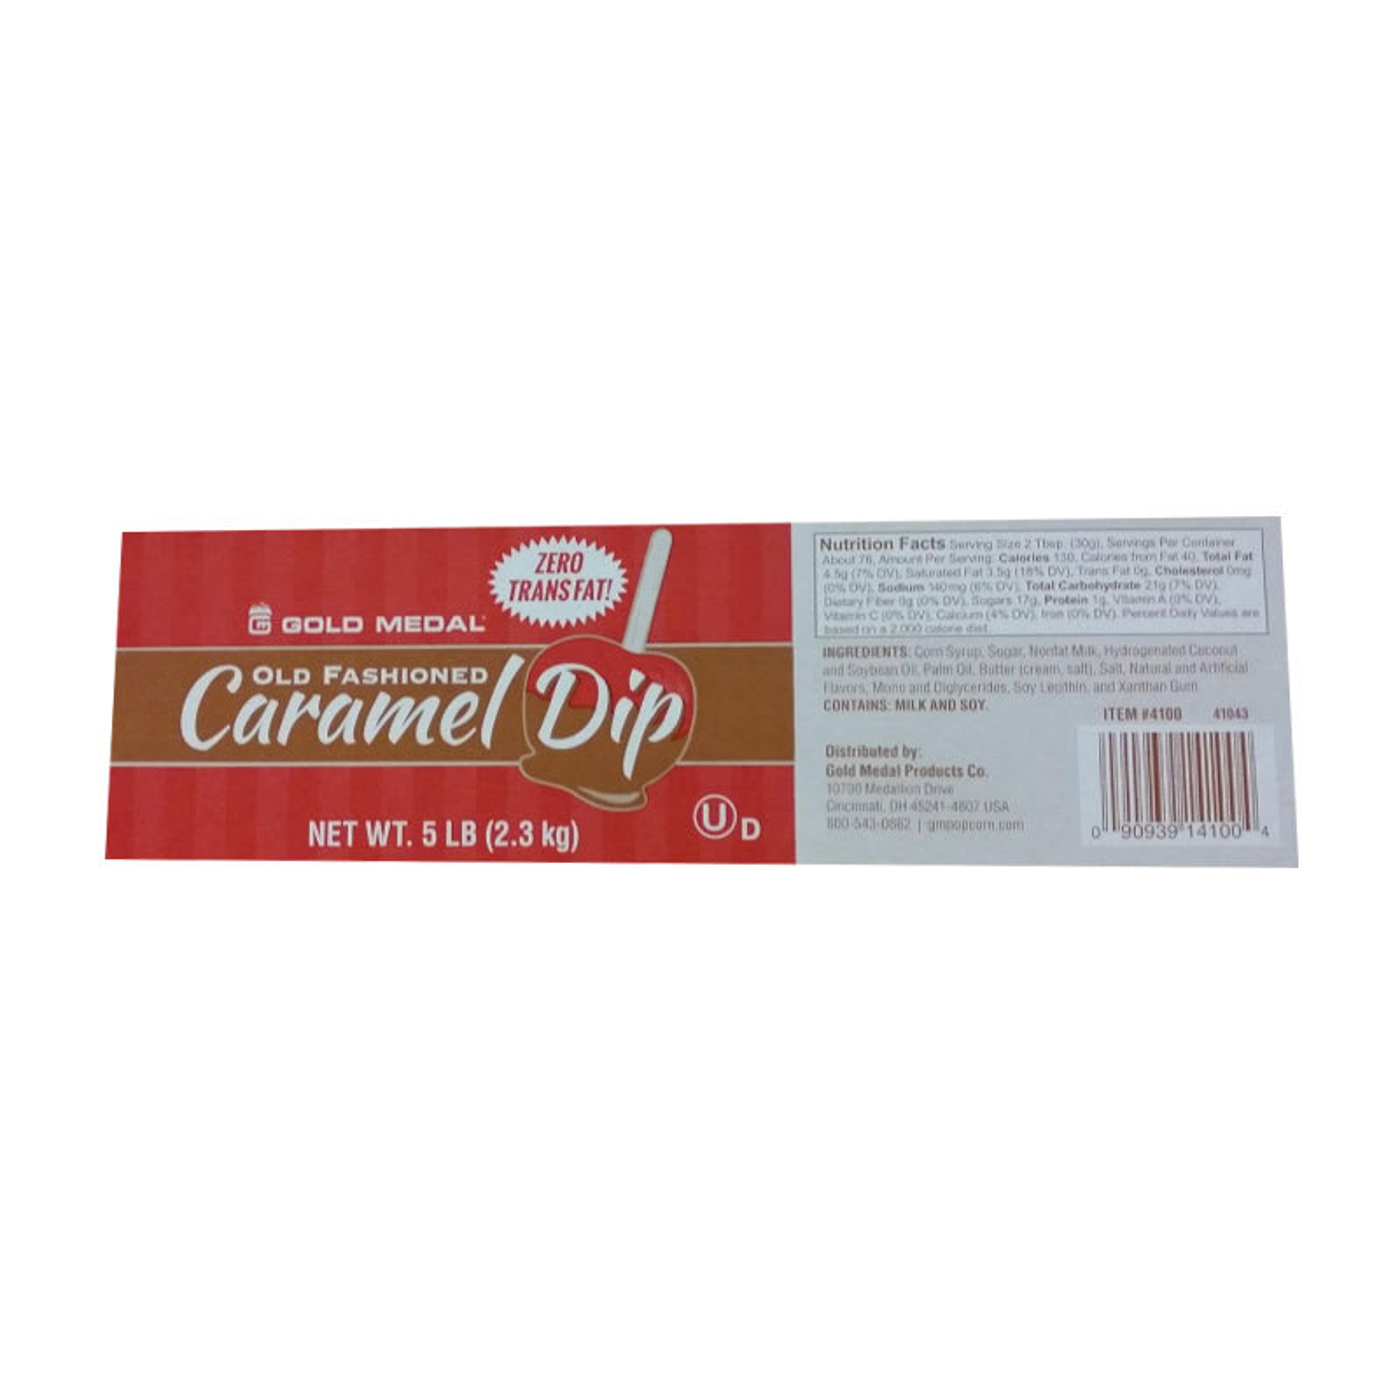 Gold Medal 4100 5-lb 0g Trans Fat Old Fashioned Caramel Apple Dip